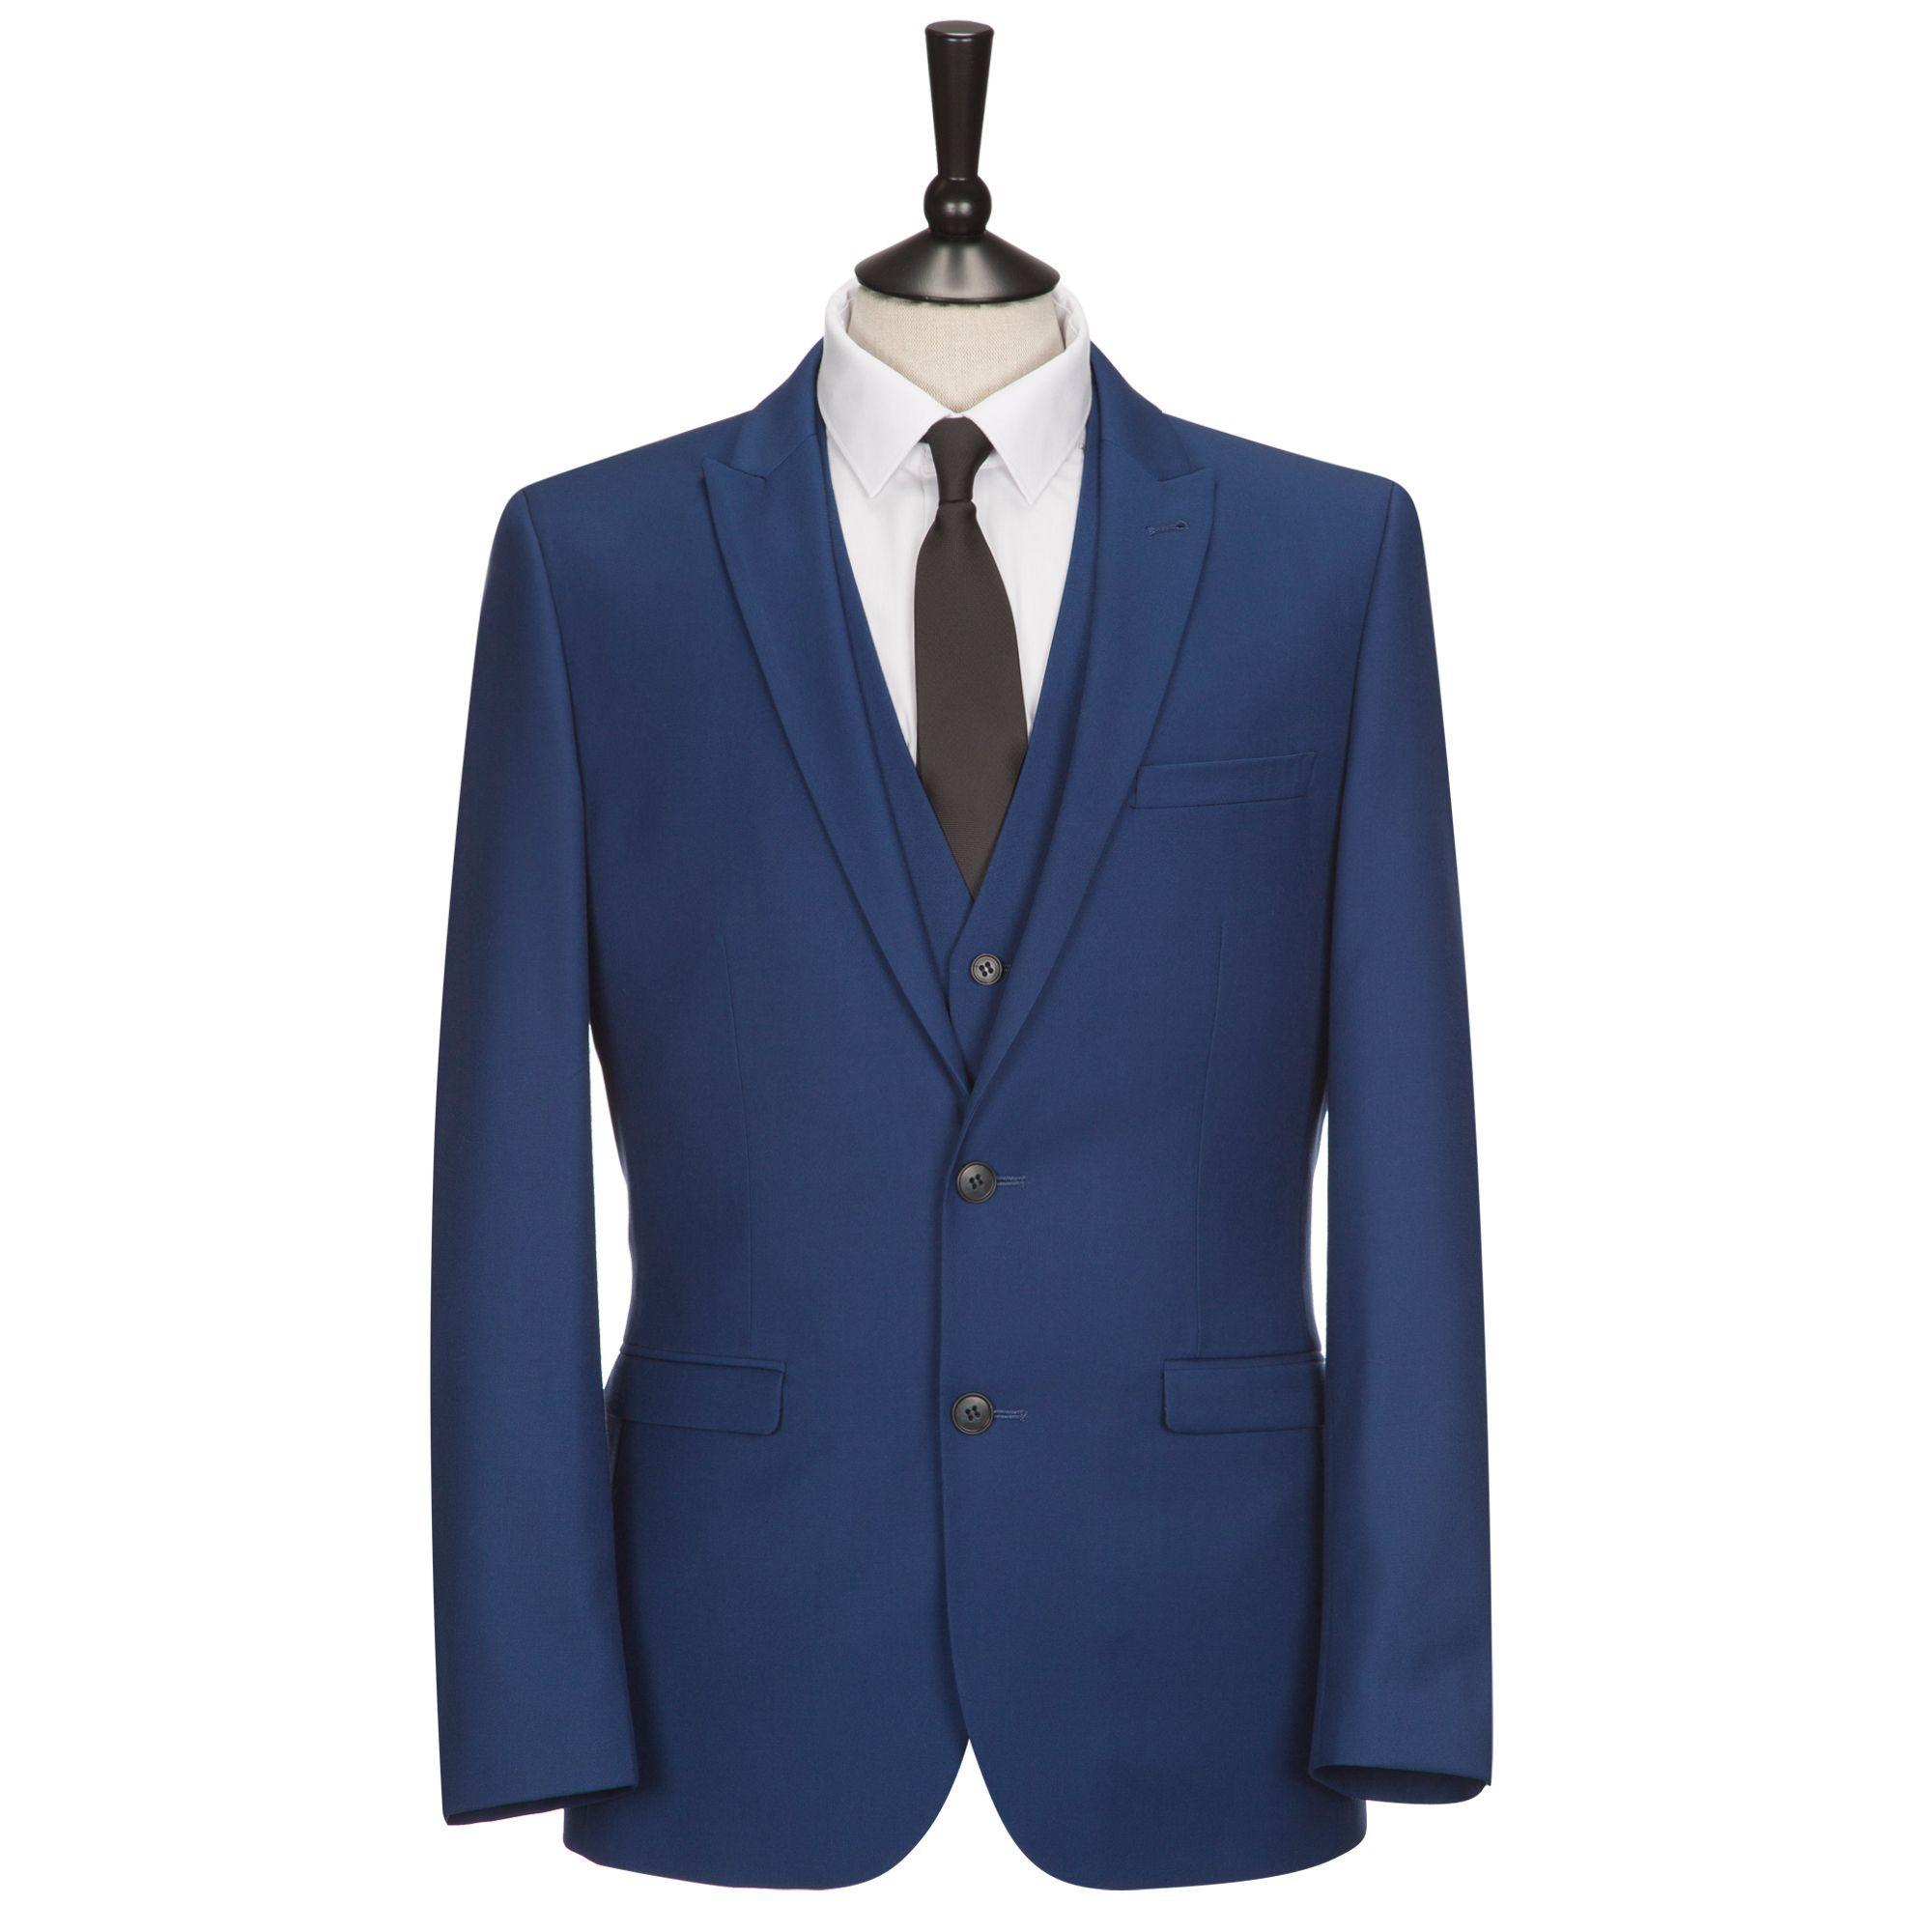 ONESIX5IVE Royal Blue Three Piece Slim Fit Suit